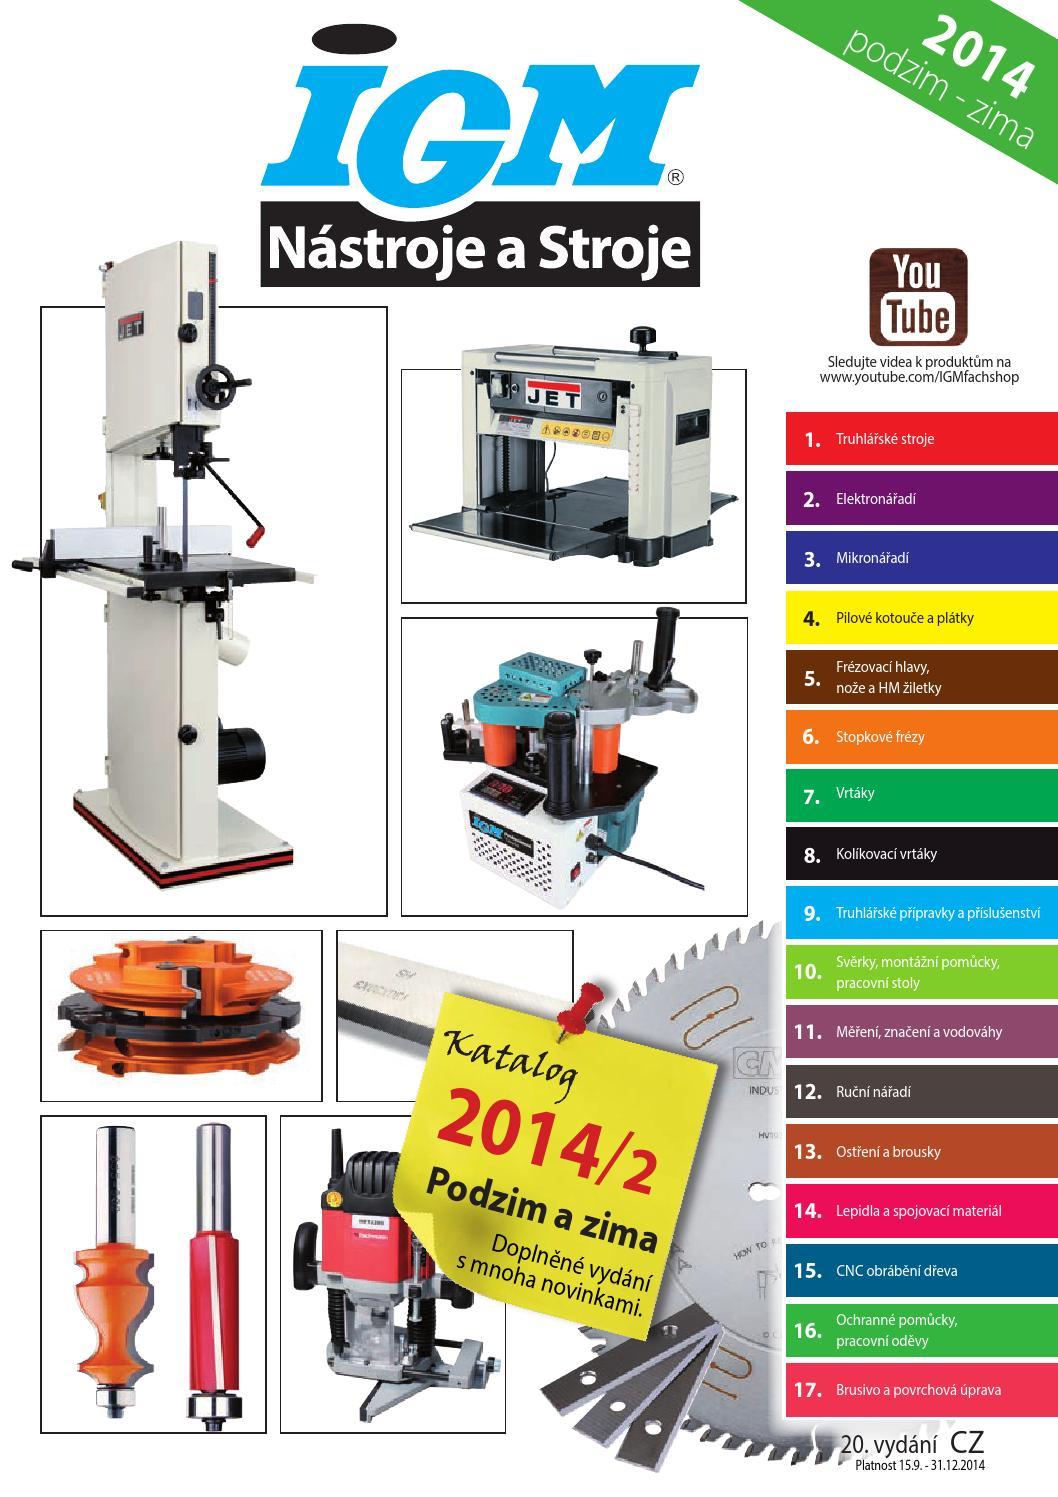 Katalog 2014 2 IGM Nástroje a stroje by IGM nástroje a stroje - issuu e789d0eb5b